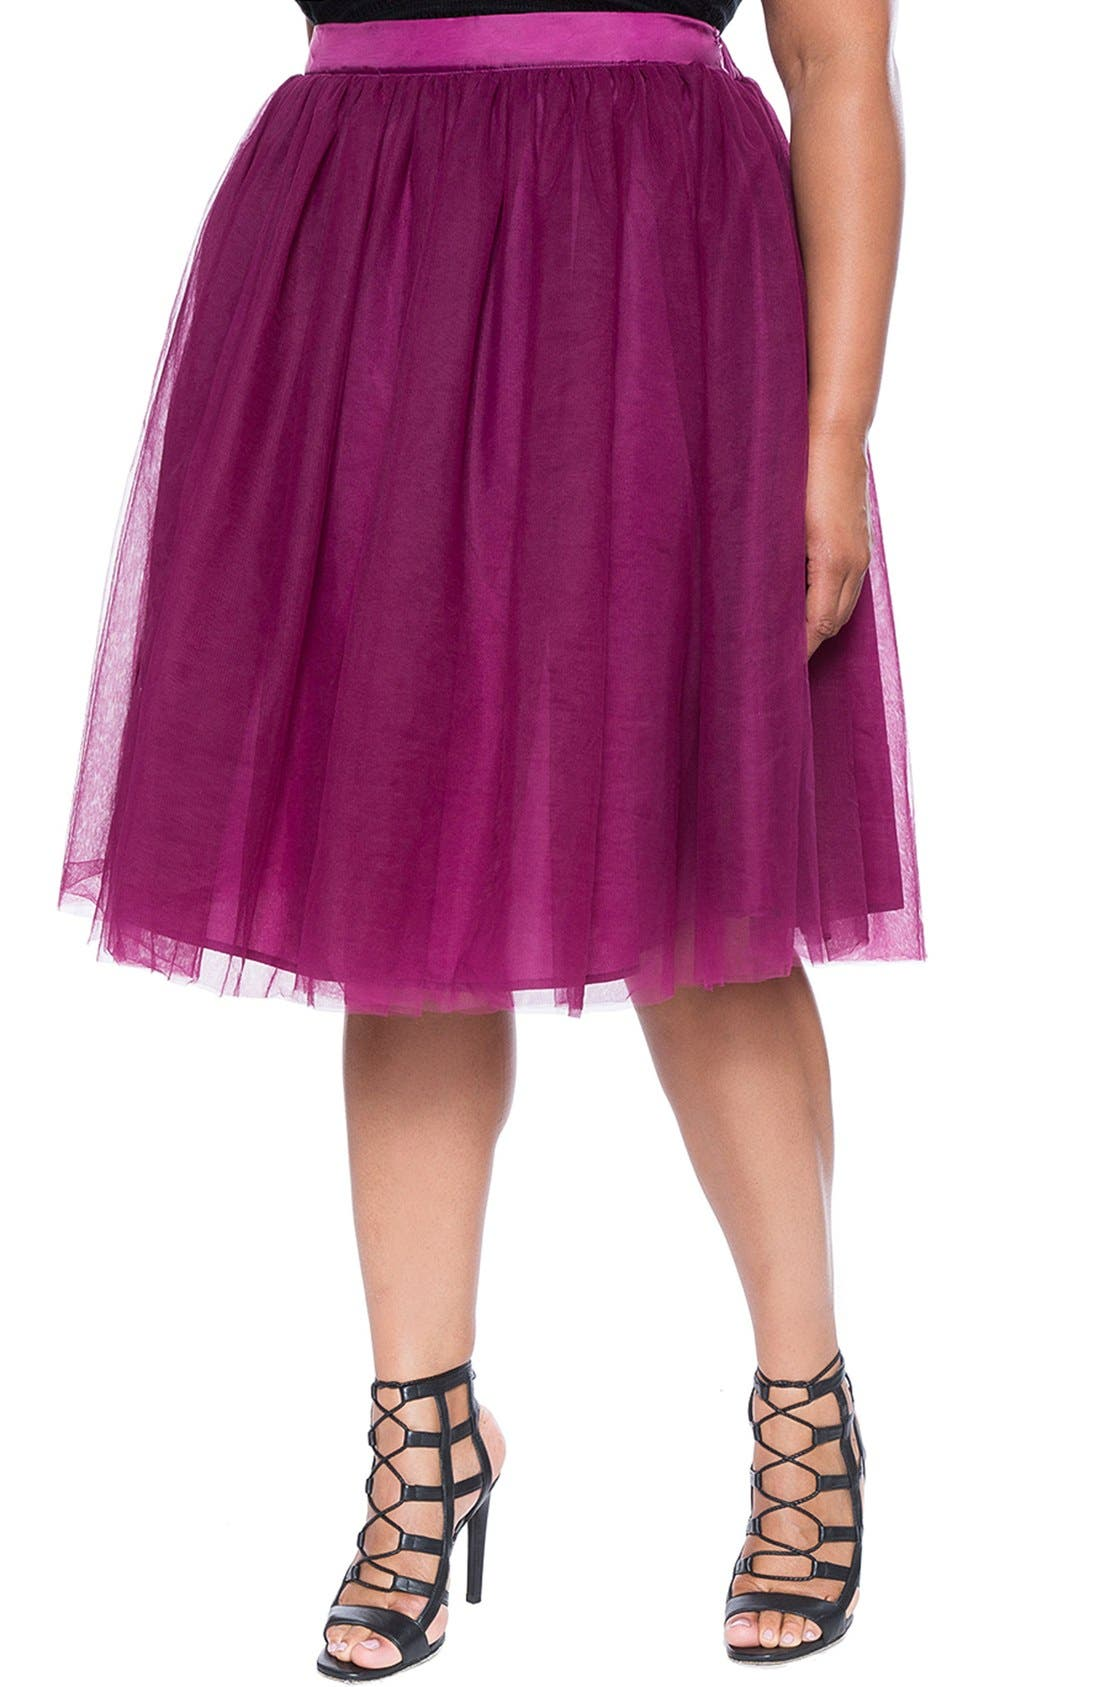 Main Image - ELOQUIITulle Midi Skirt (Plus Size)